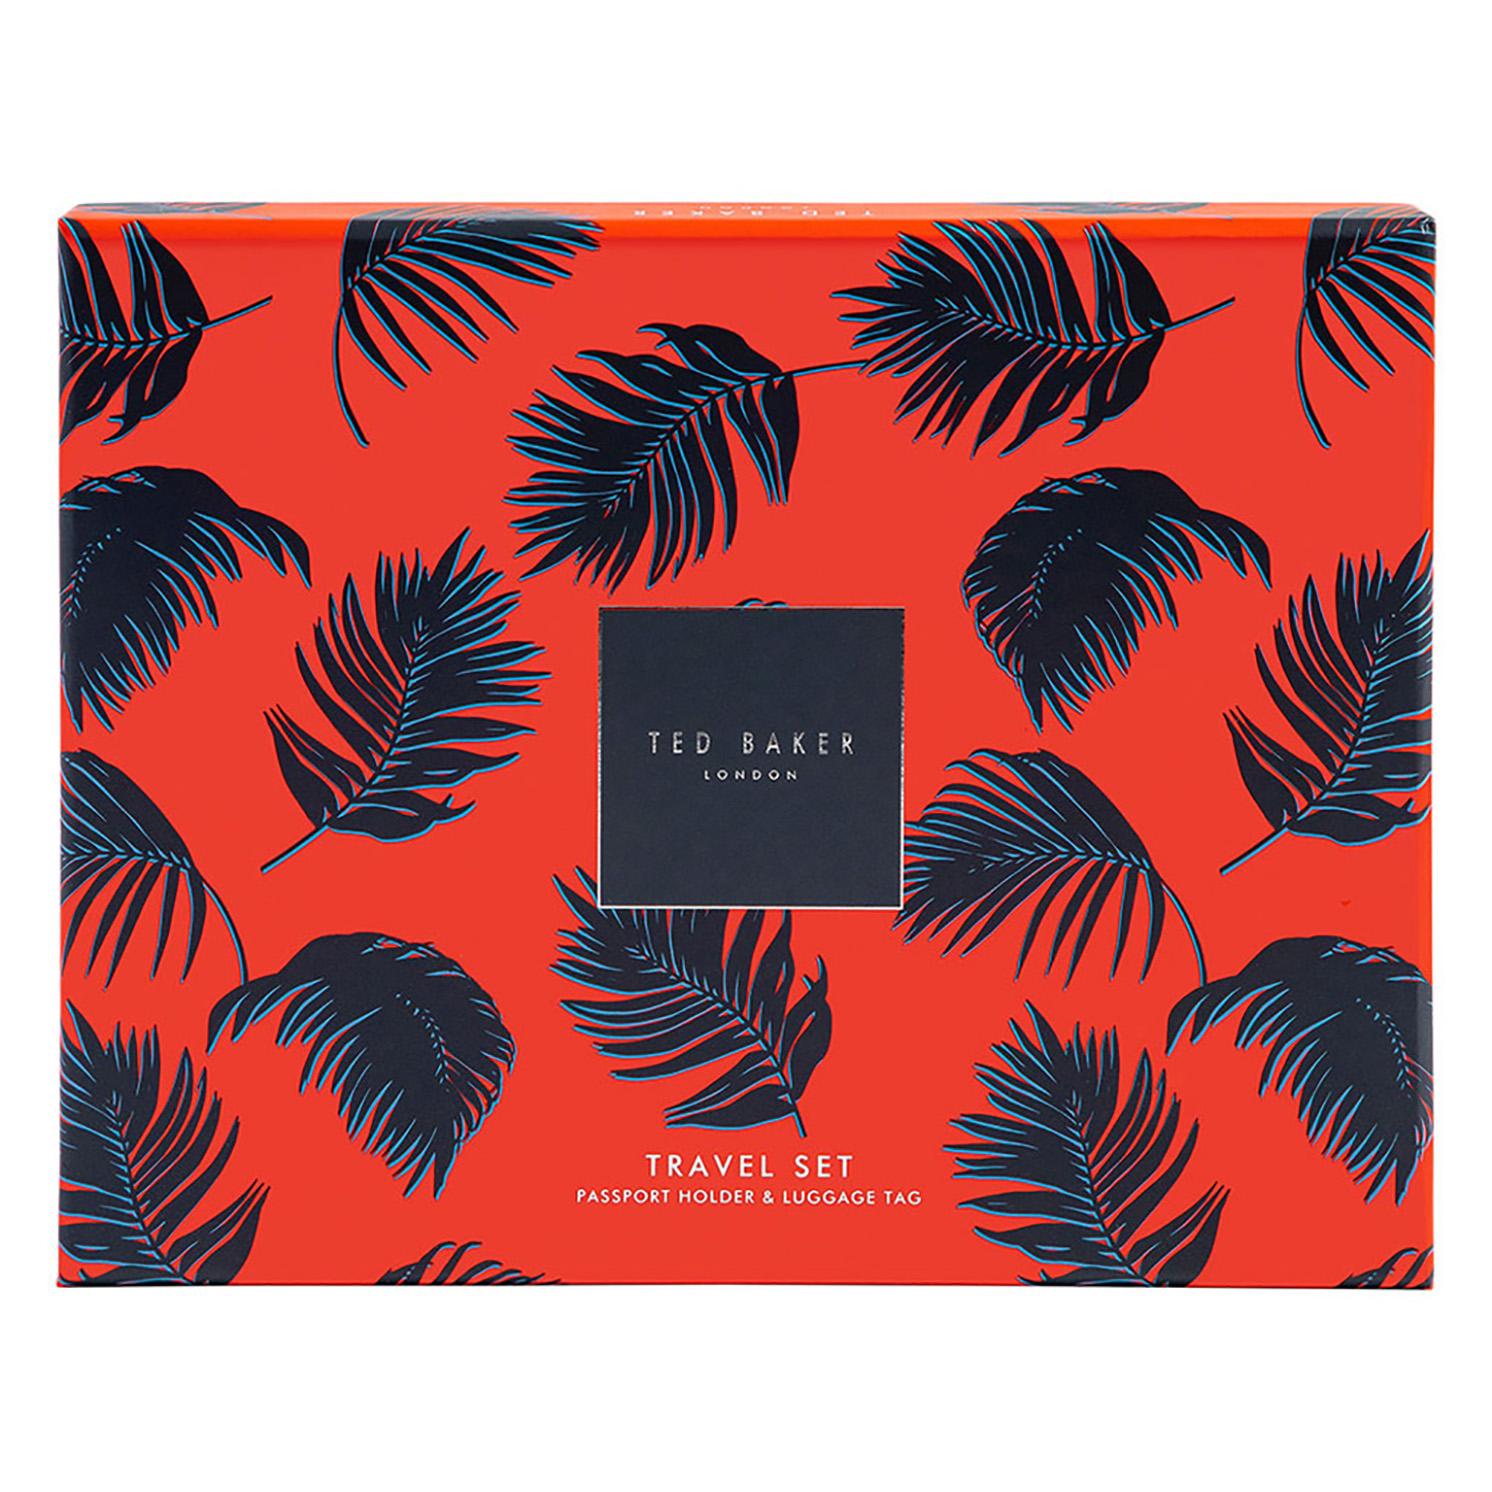 Ted Baker – Black T Travel Set in Presentation Gift Box